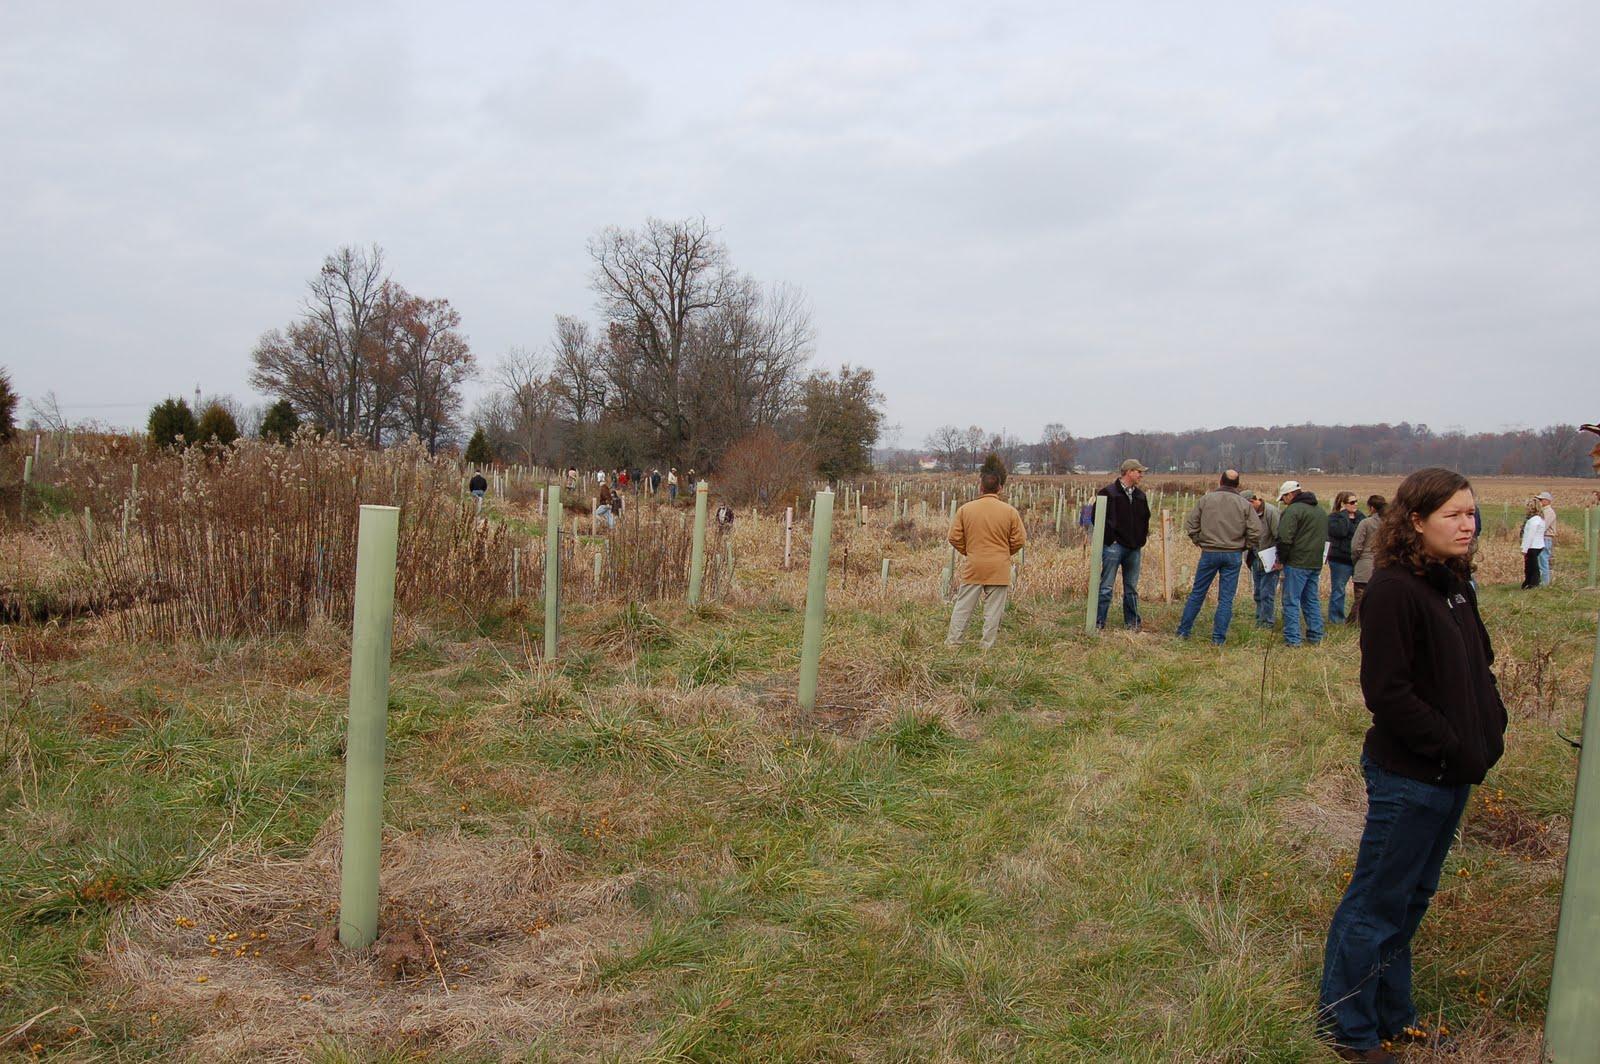 Riparian Buffer Planting Shrubs in Riparian Buffers